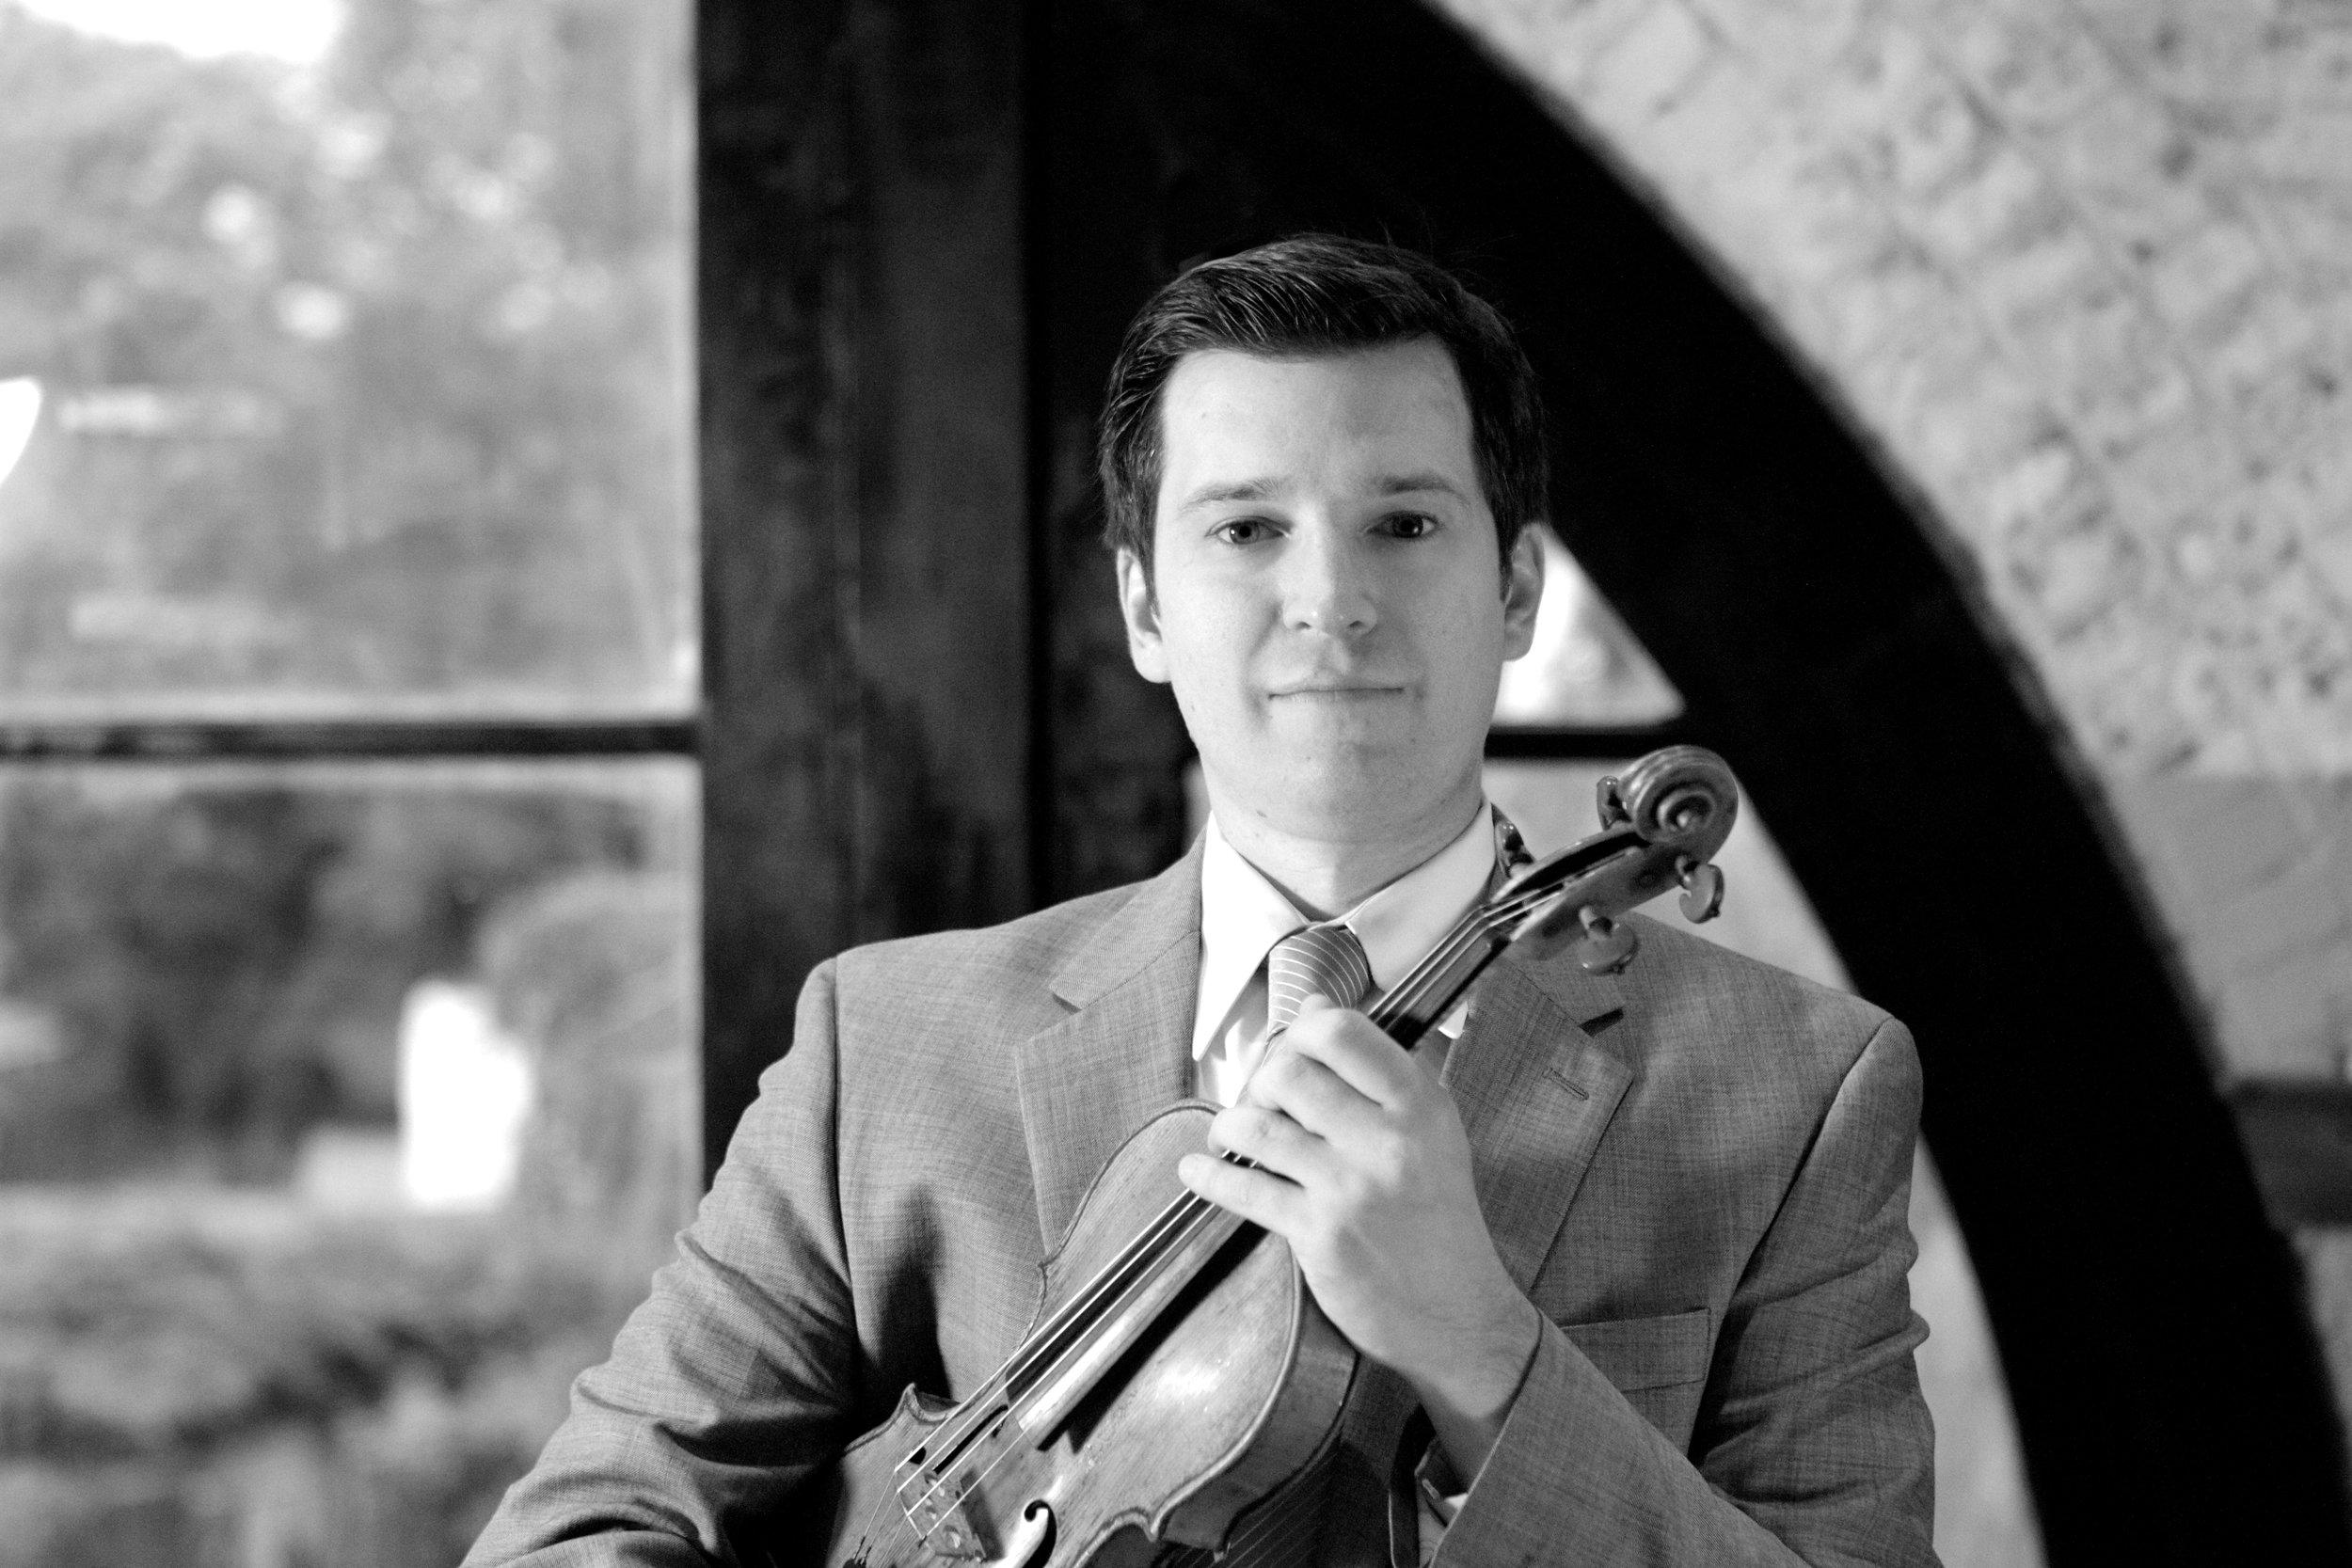 Stephen Miahky, violin